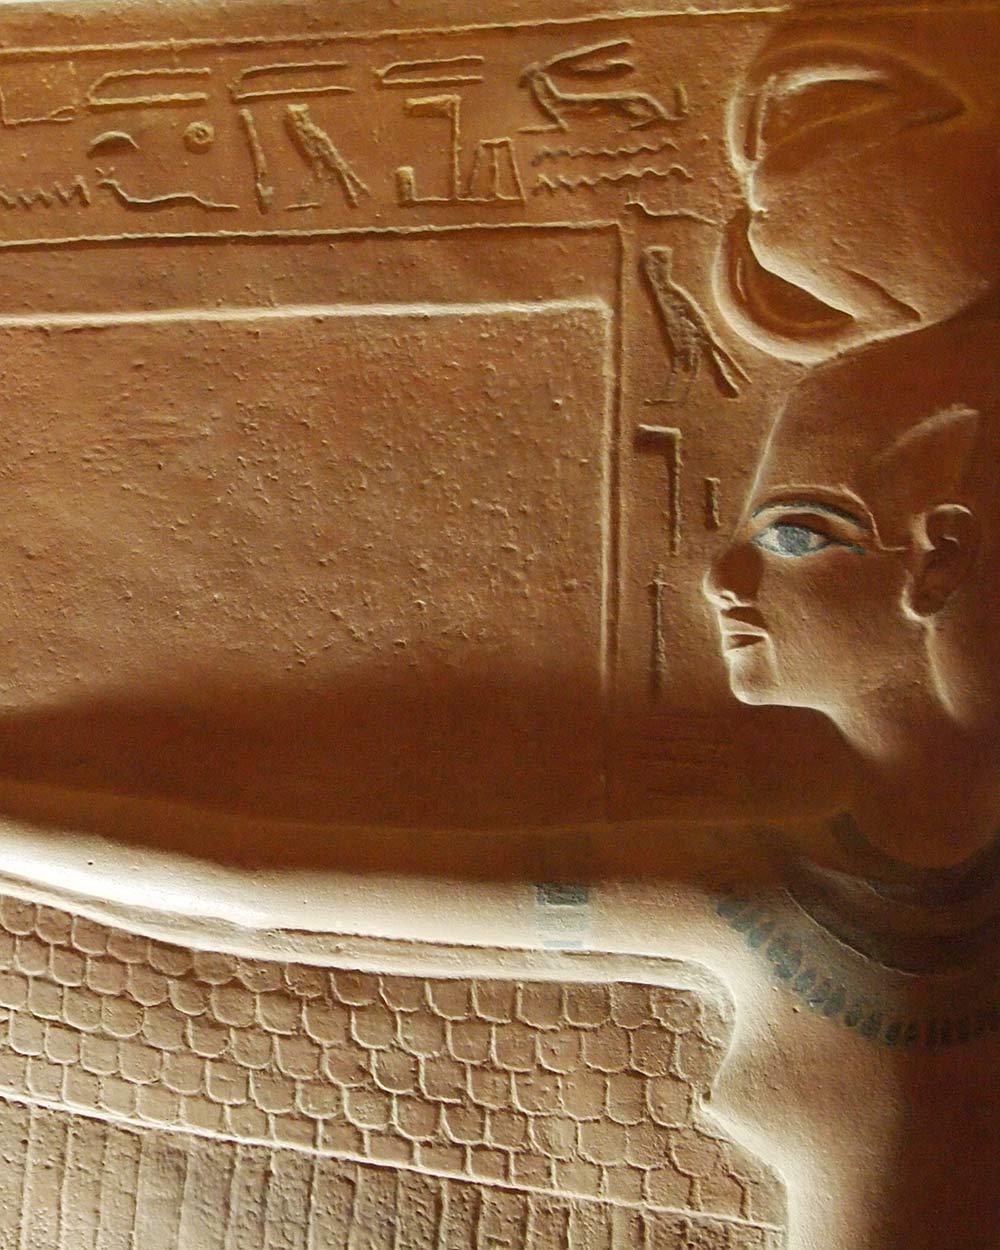 Das Alte ägypten Reise Bücher Blog Selket S ägypten